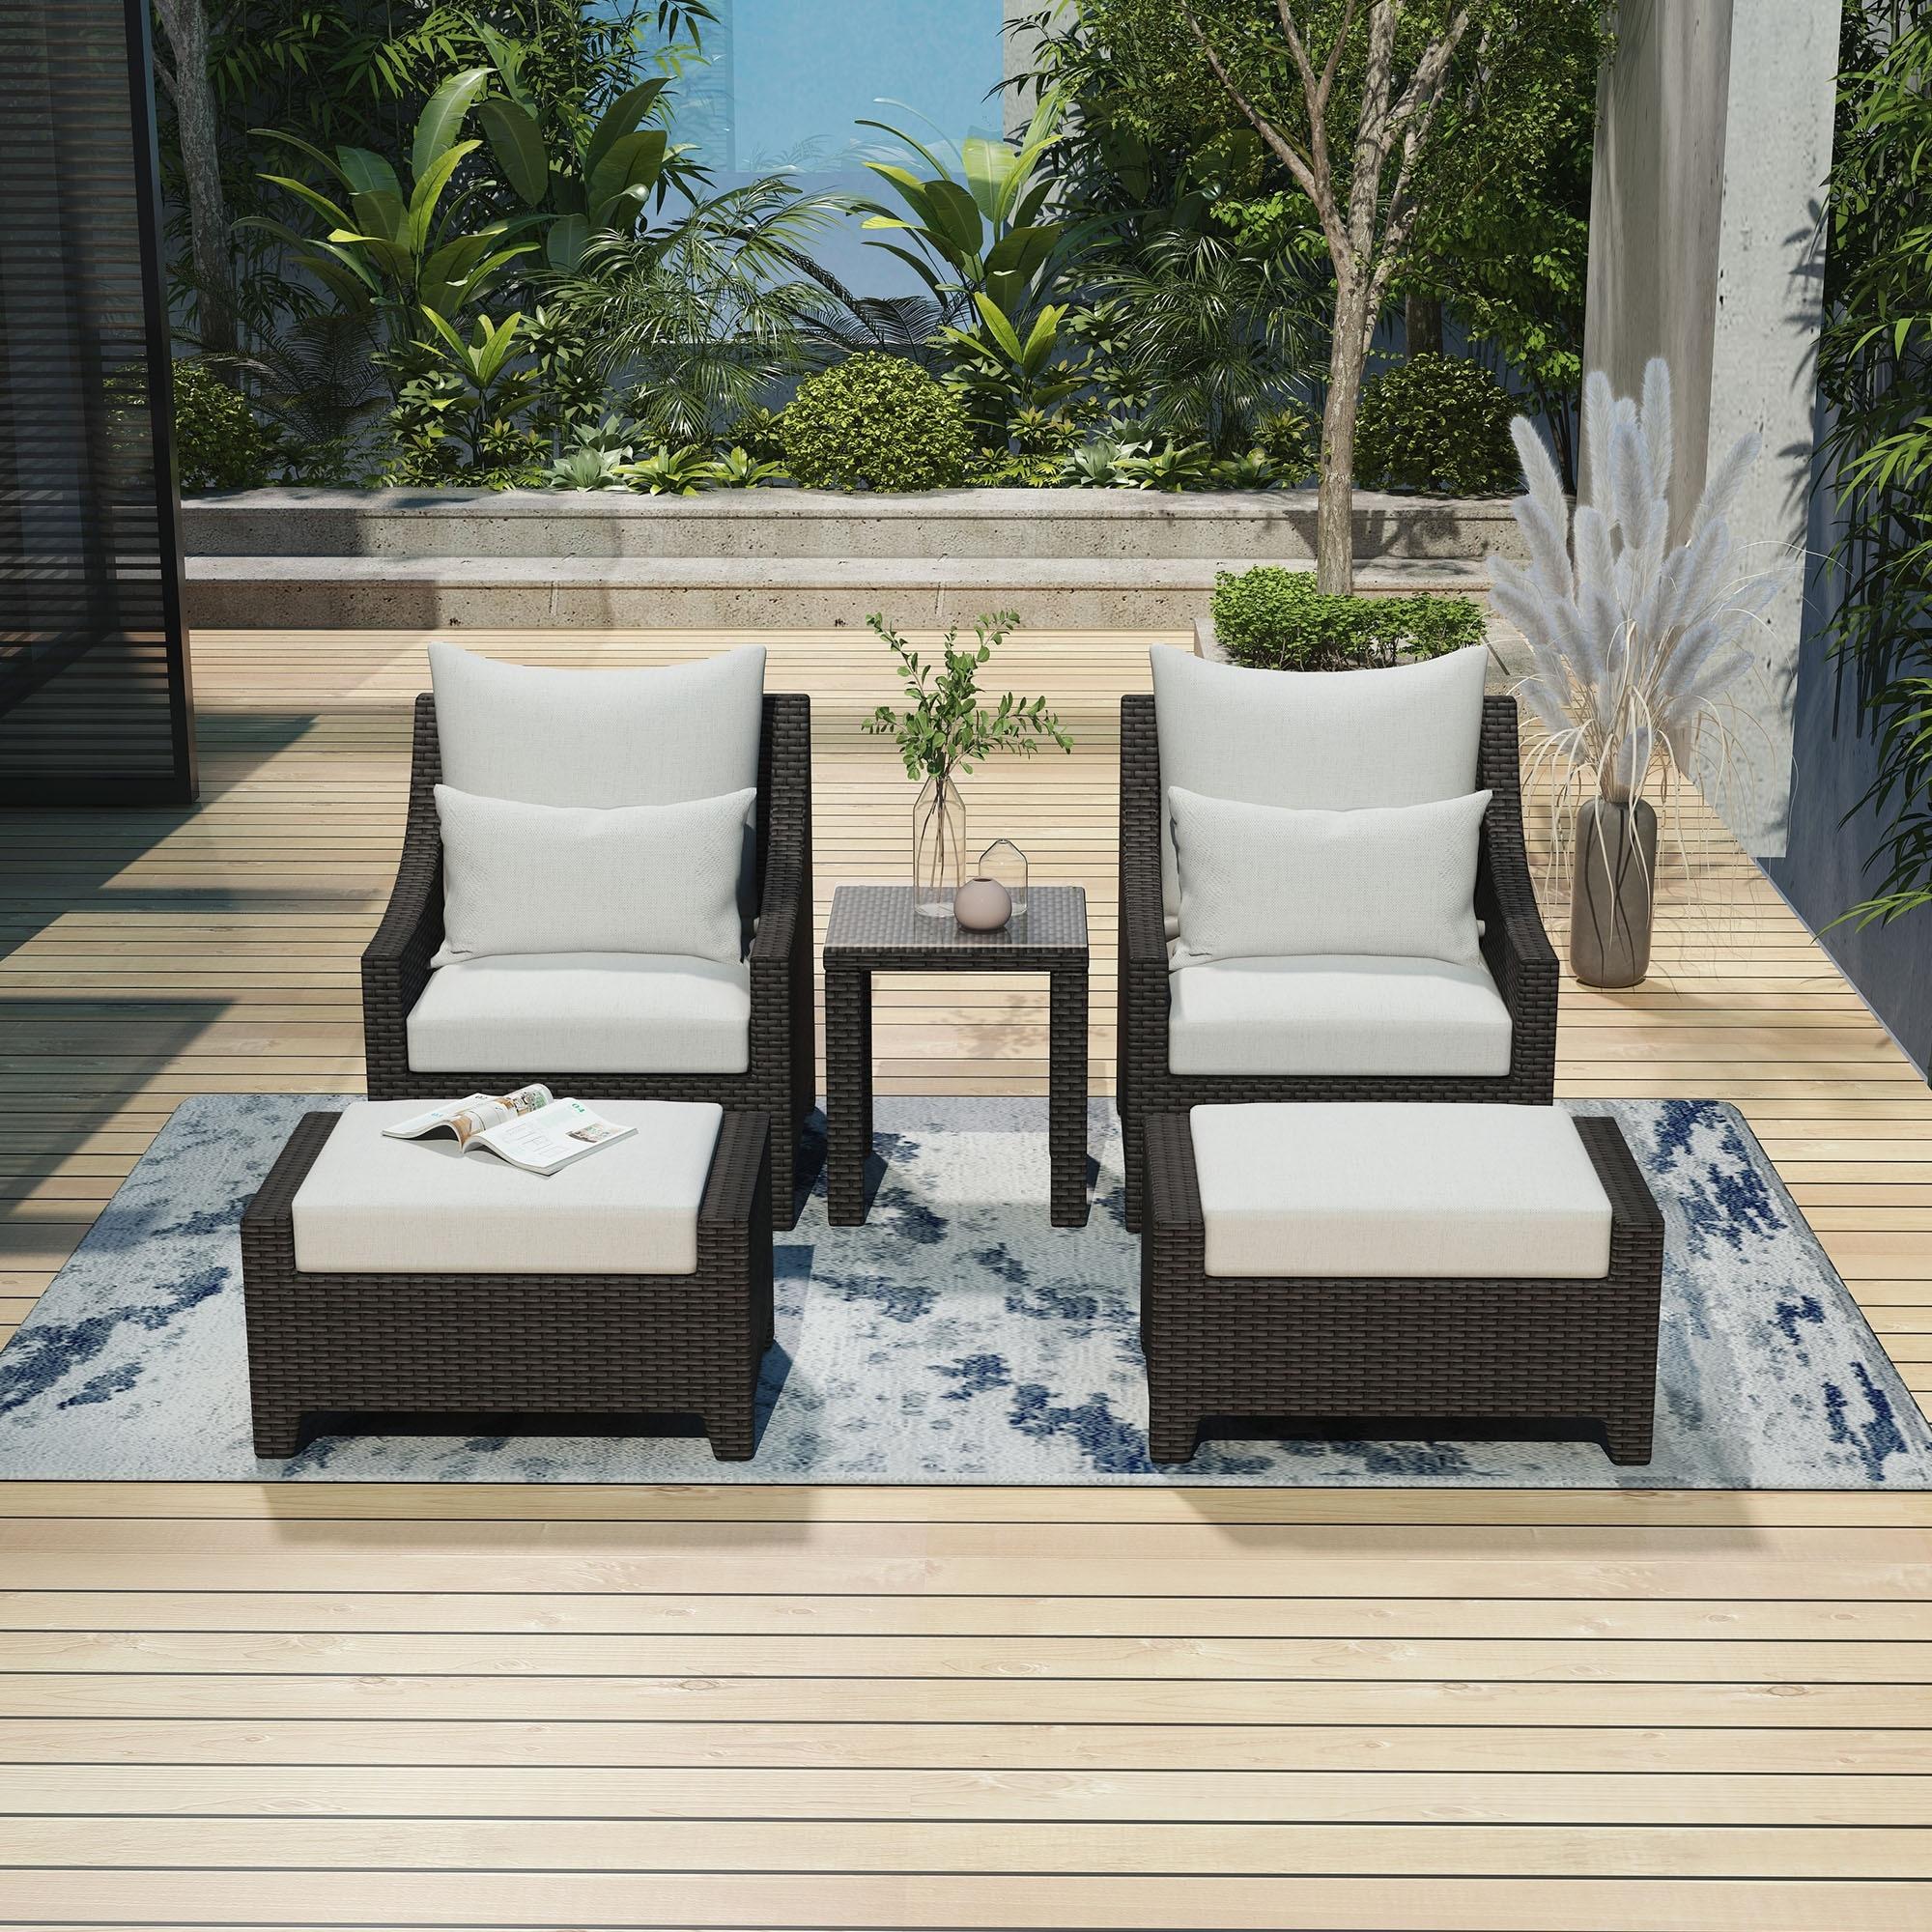 Amarantos 5 Piece Outdoor Sofa Conversation Set Wicker Club Chair And Ottoman Patio Furniture Set Deep Seating Overstock 31743411